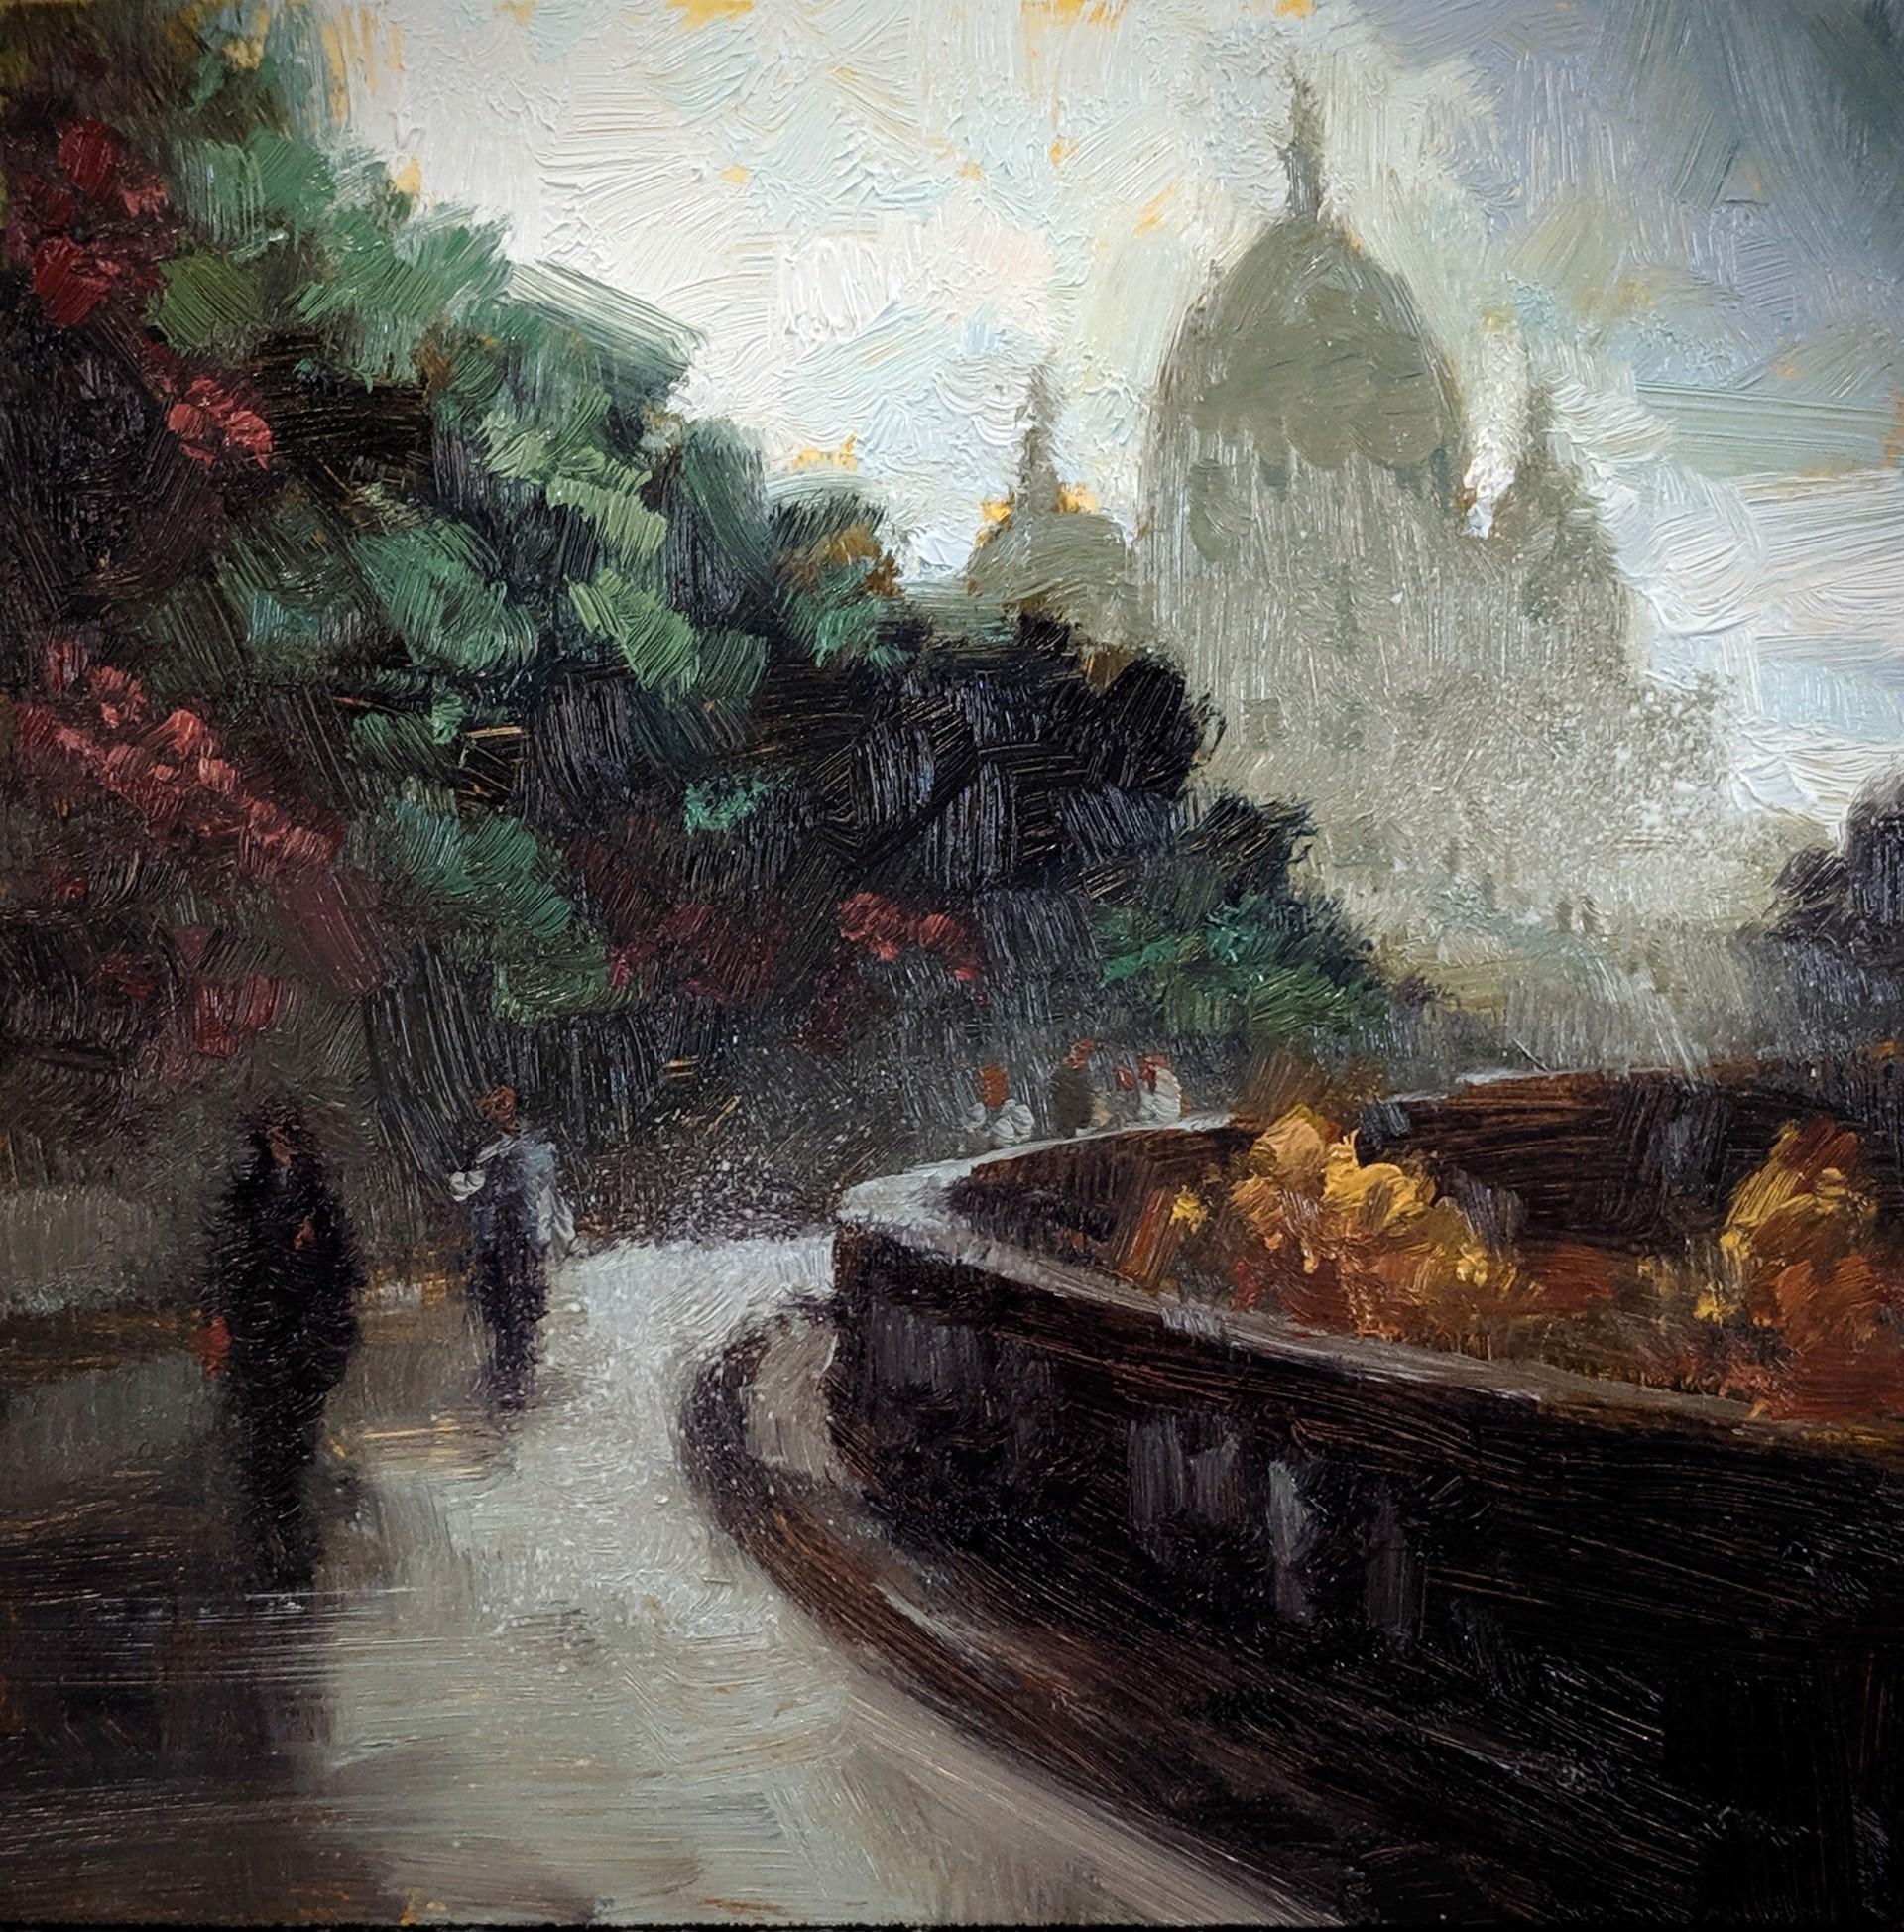 Story of Paris, Vol I, No. 9 by Christopher Clark